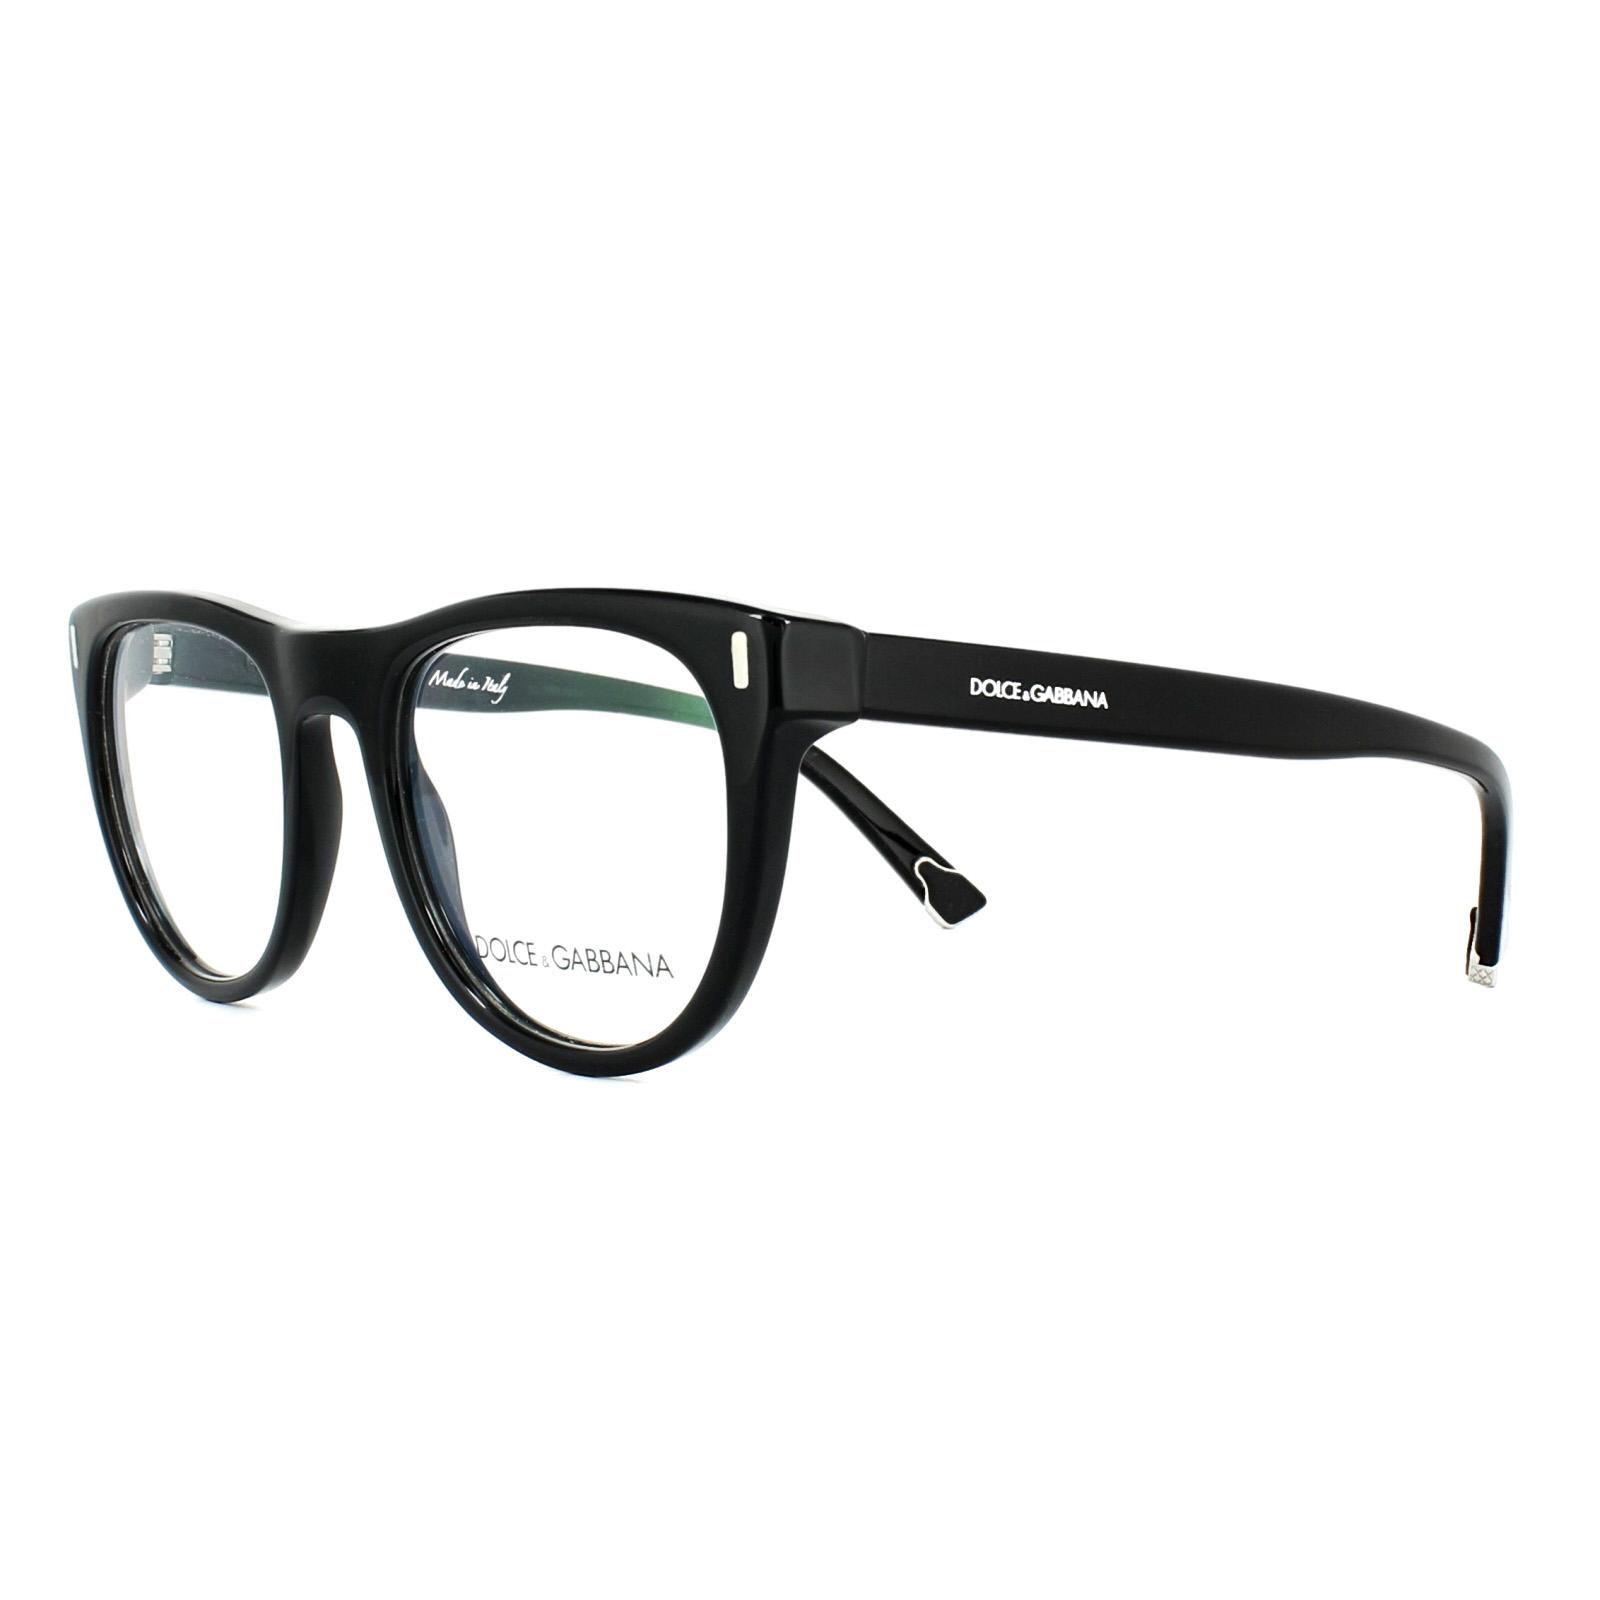 a8b666949b8d Sentinel Dolce & Gabbana Glasses Frames DG 3248 501 Black 52mm Mens